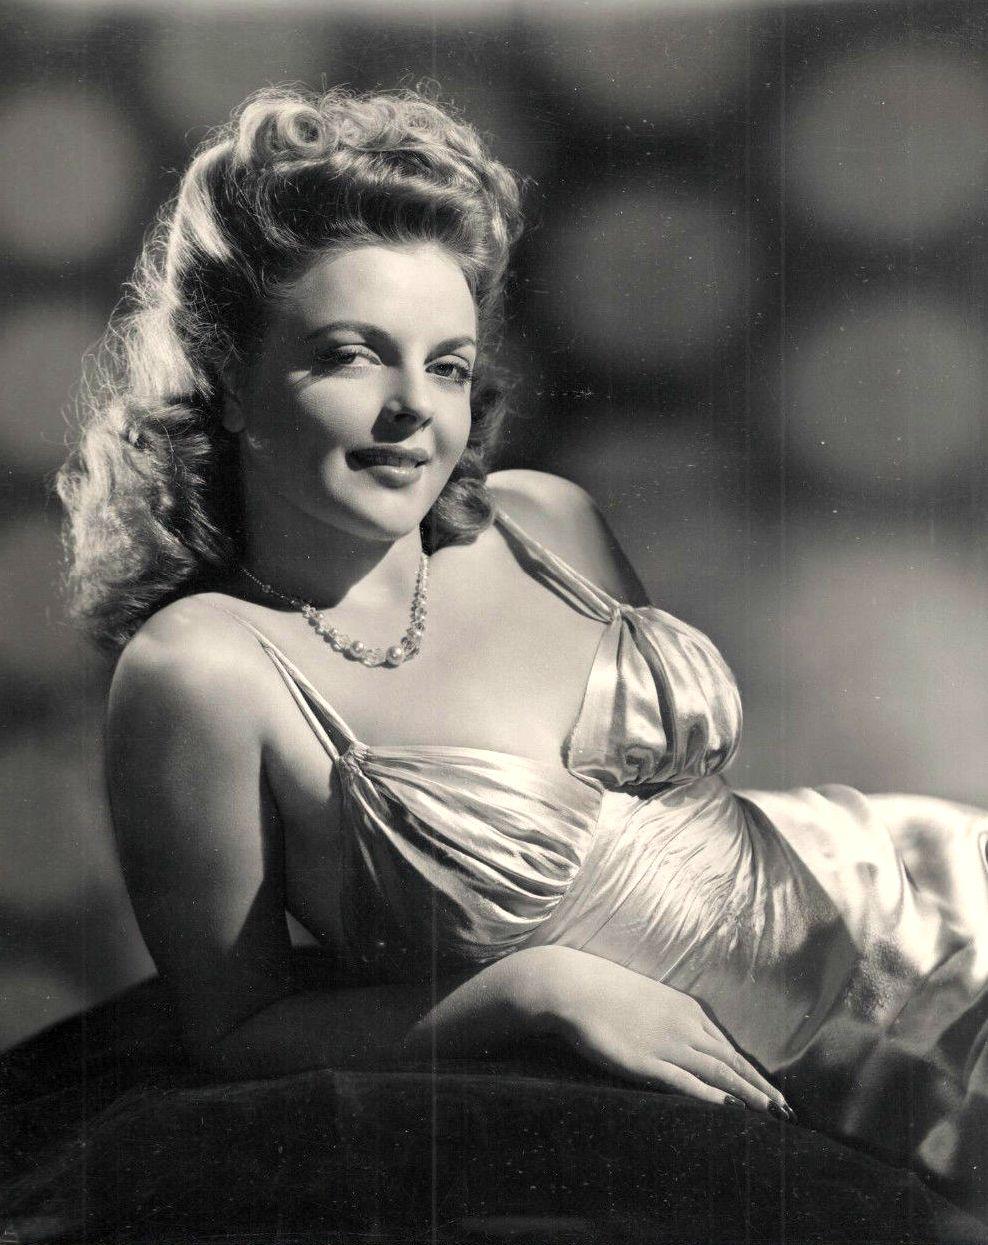 Juanita Stark in Thank Your Lucky Stars (1943)